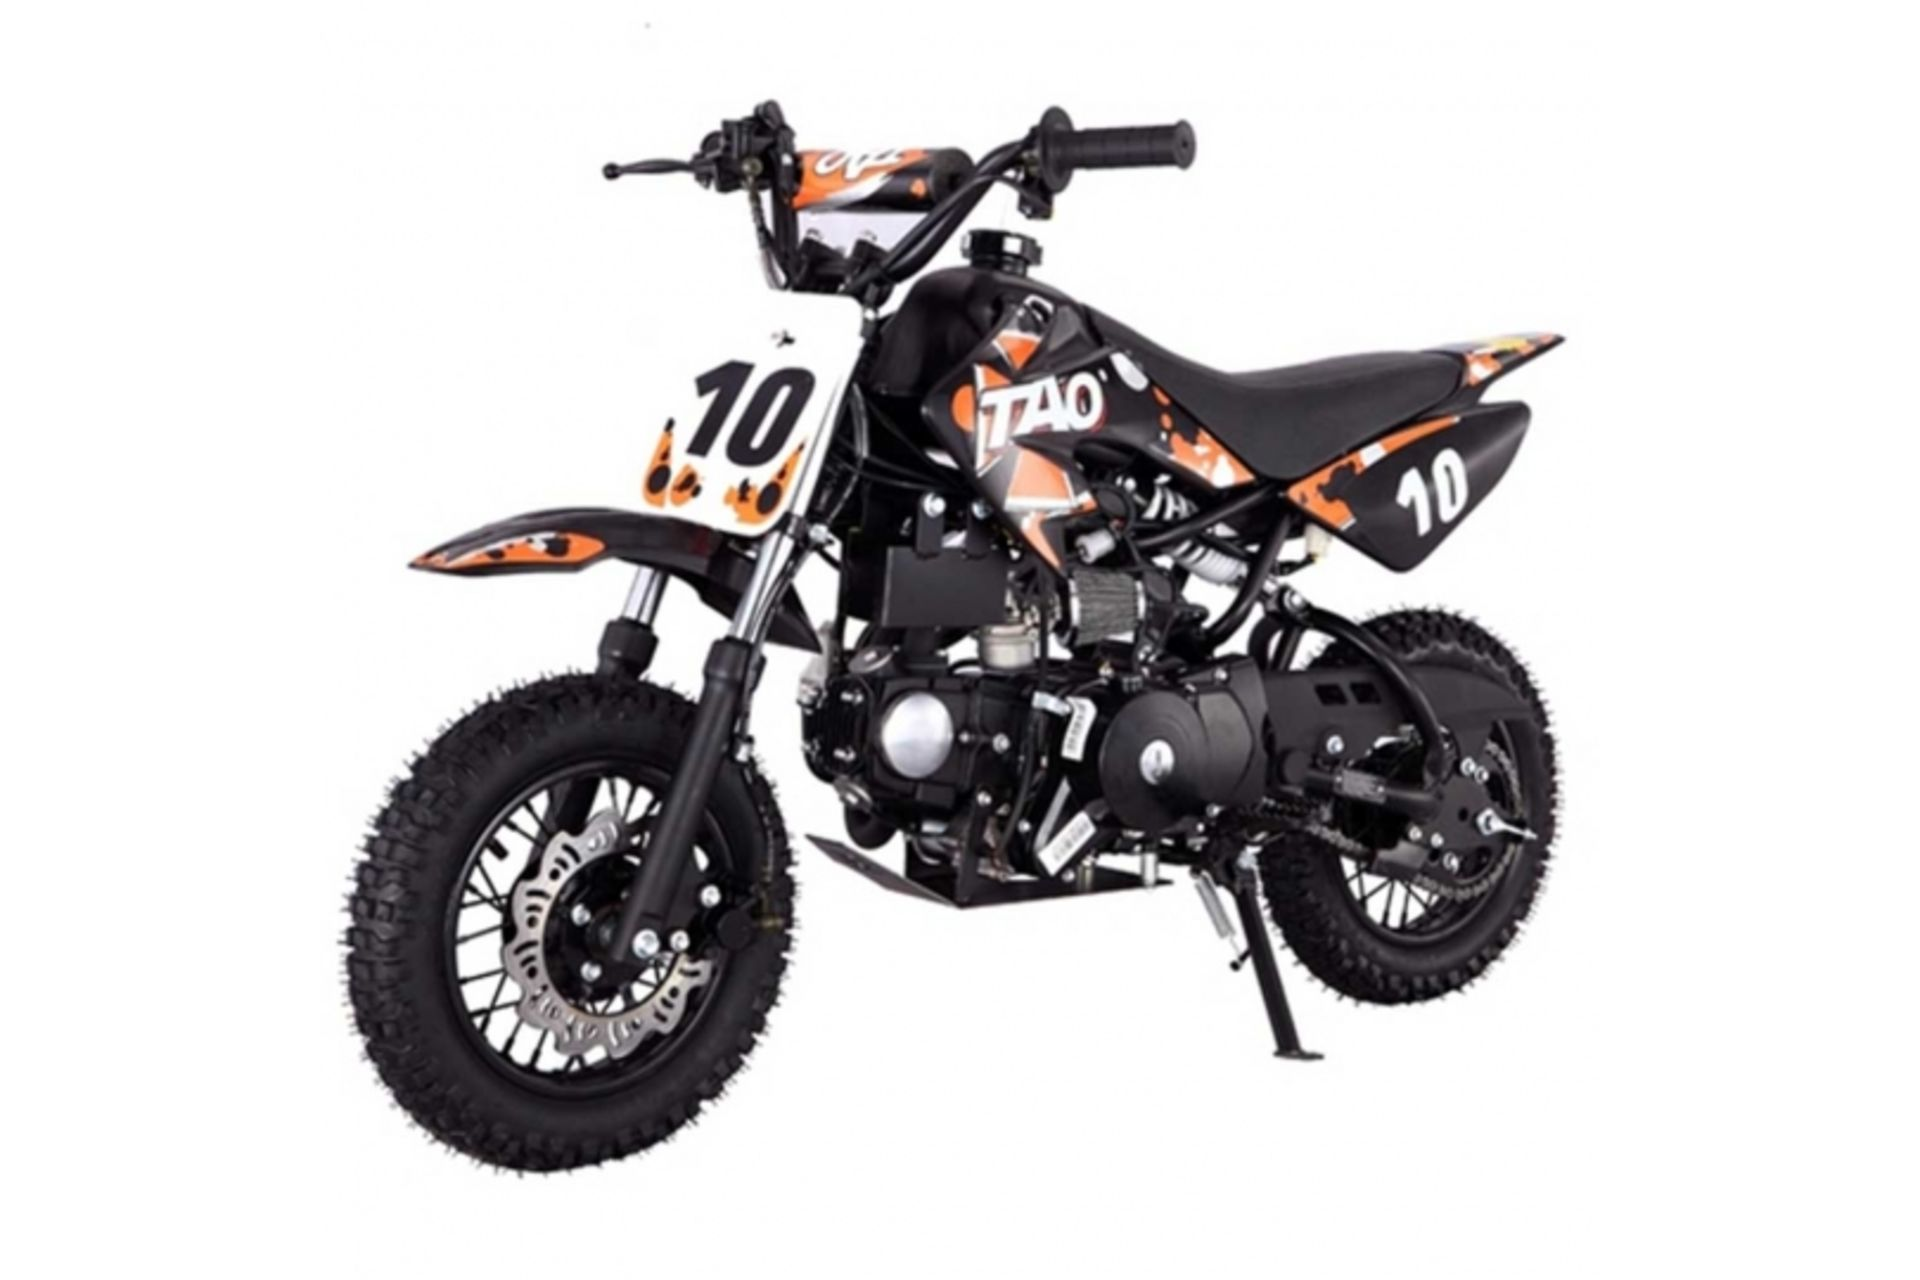 Lot 23534 - V Brand New 110cc USA Motocross Mini Dirt Bike - Electric Start - Air Cooled 4 Stroke -